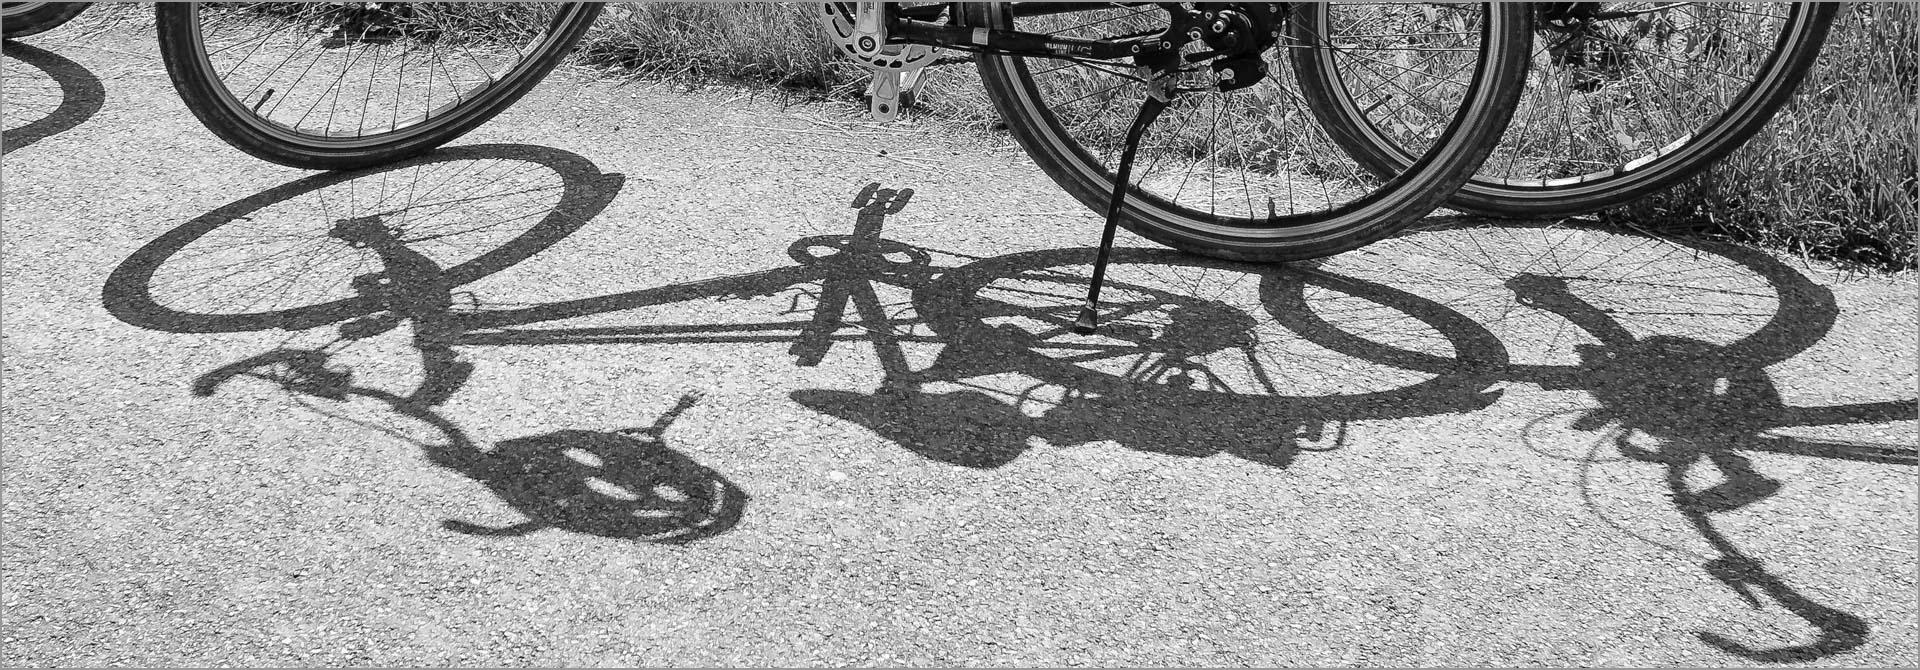 Keep Those Wheels Moving